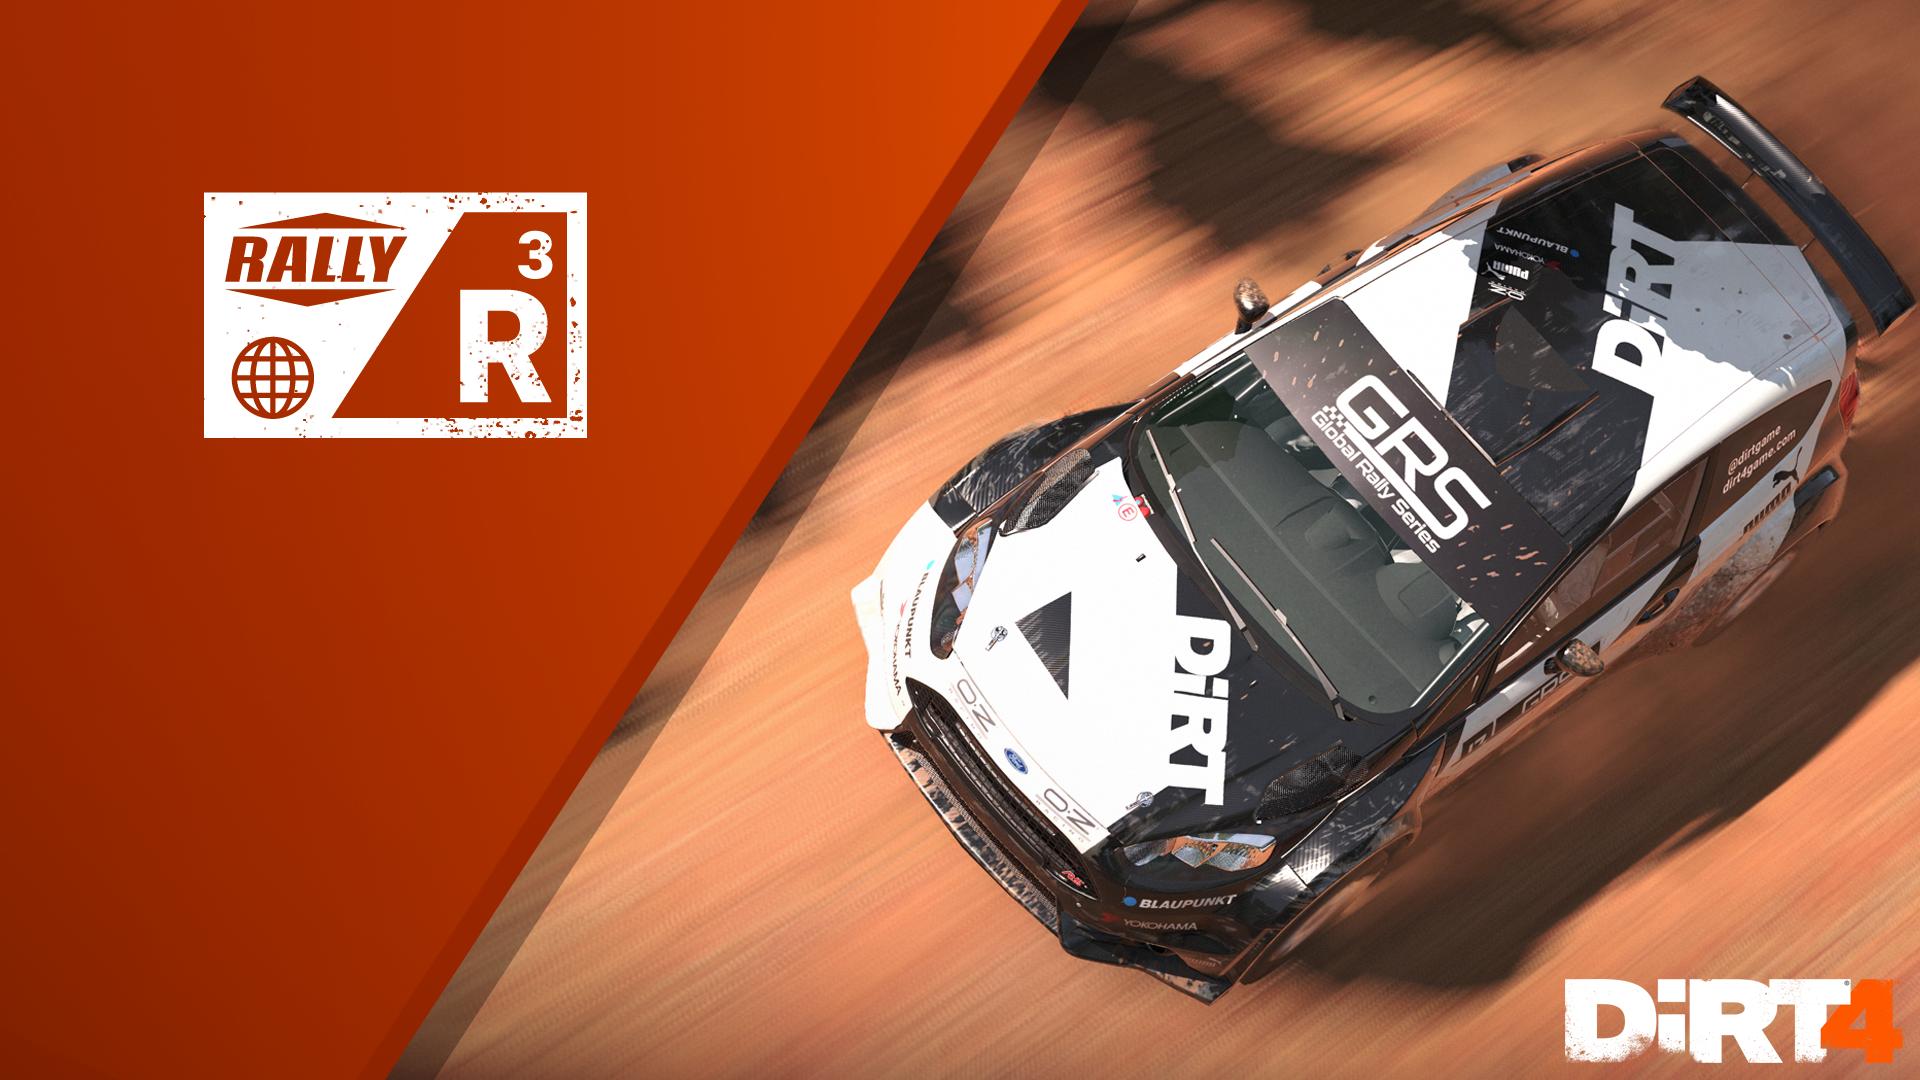 International Rally R-3